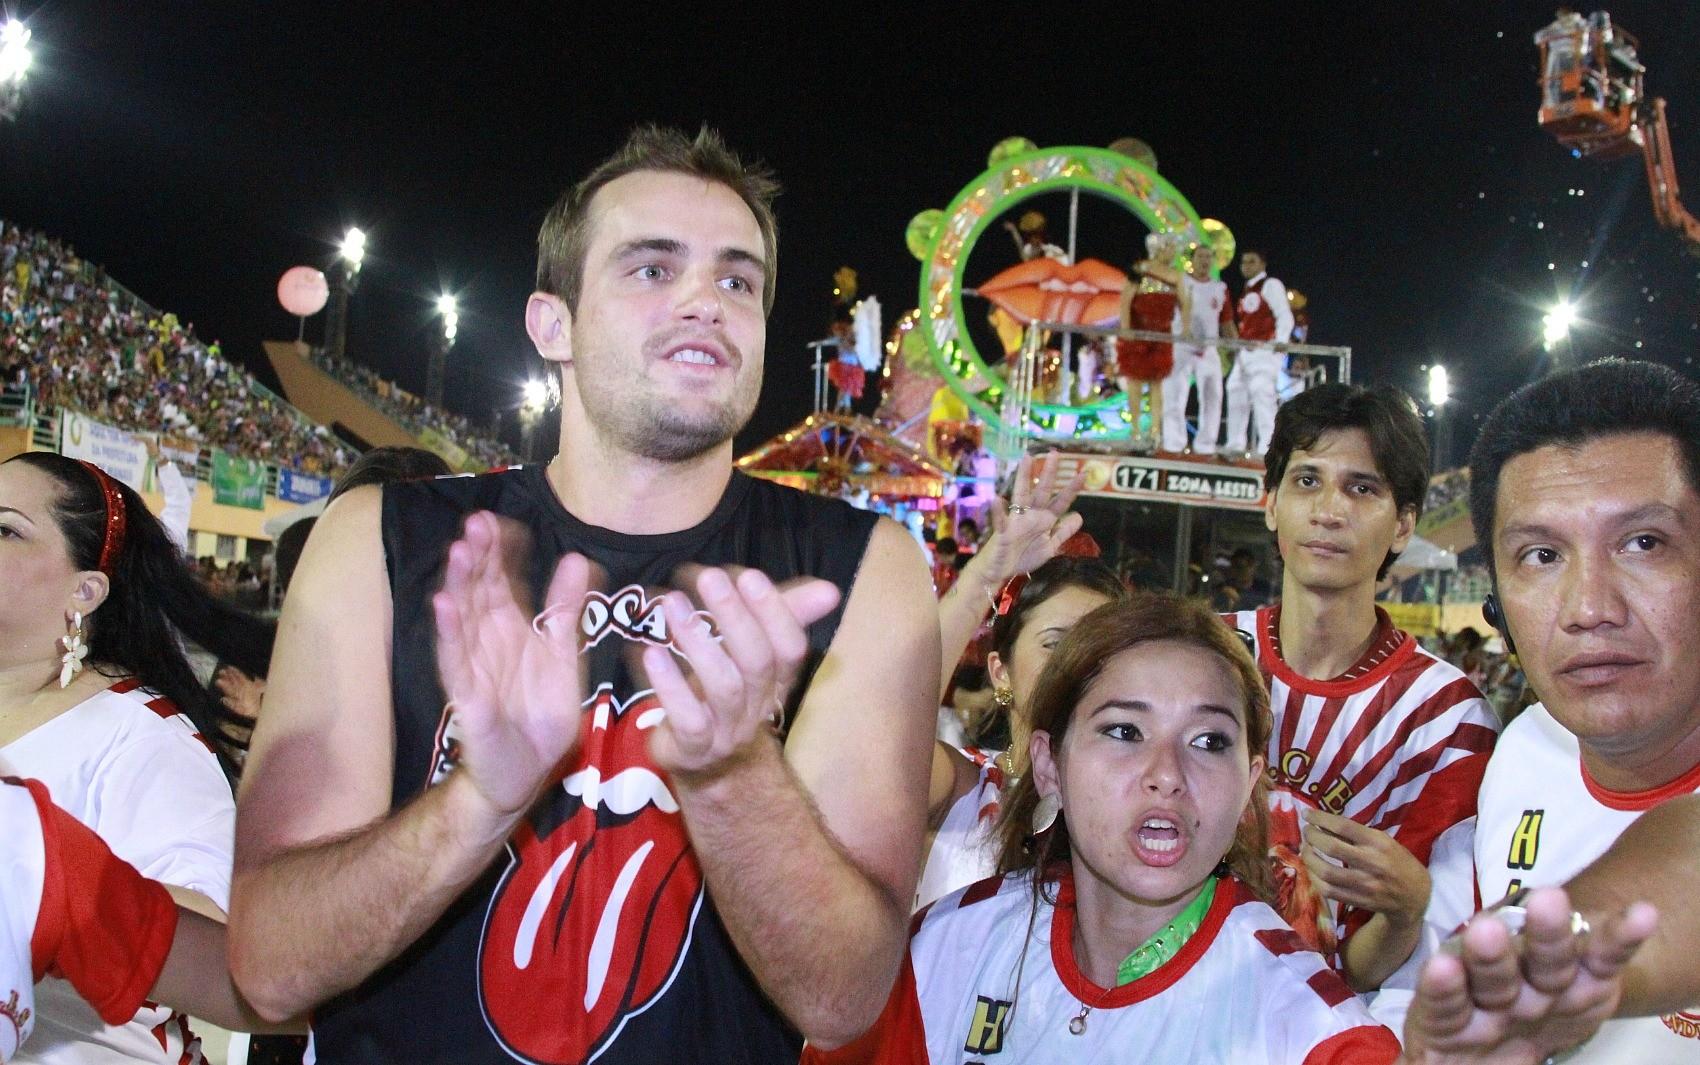 Max Fercondini desceu de destaque para sambar com torcedores da escola (Foto: Frank Cunha/G1)